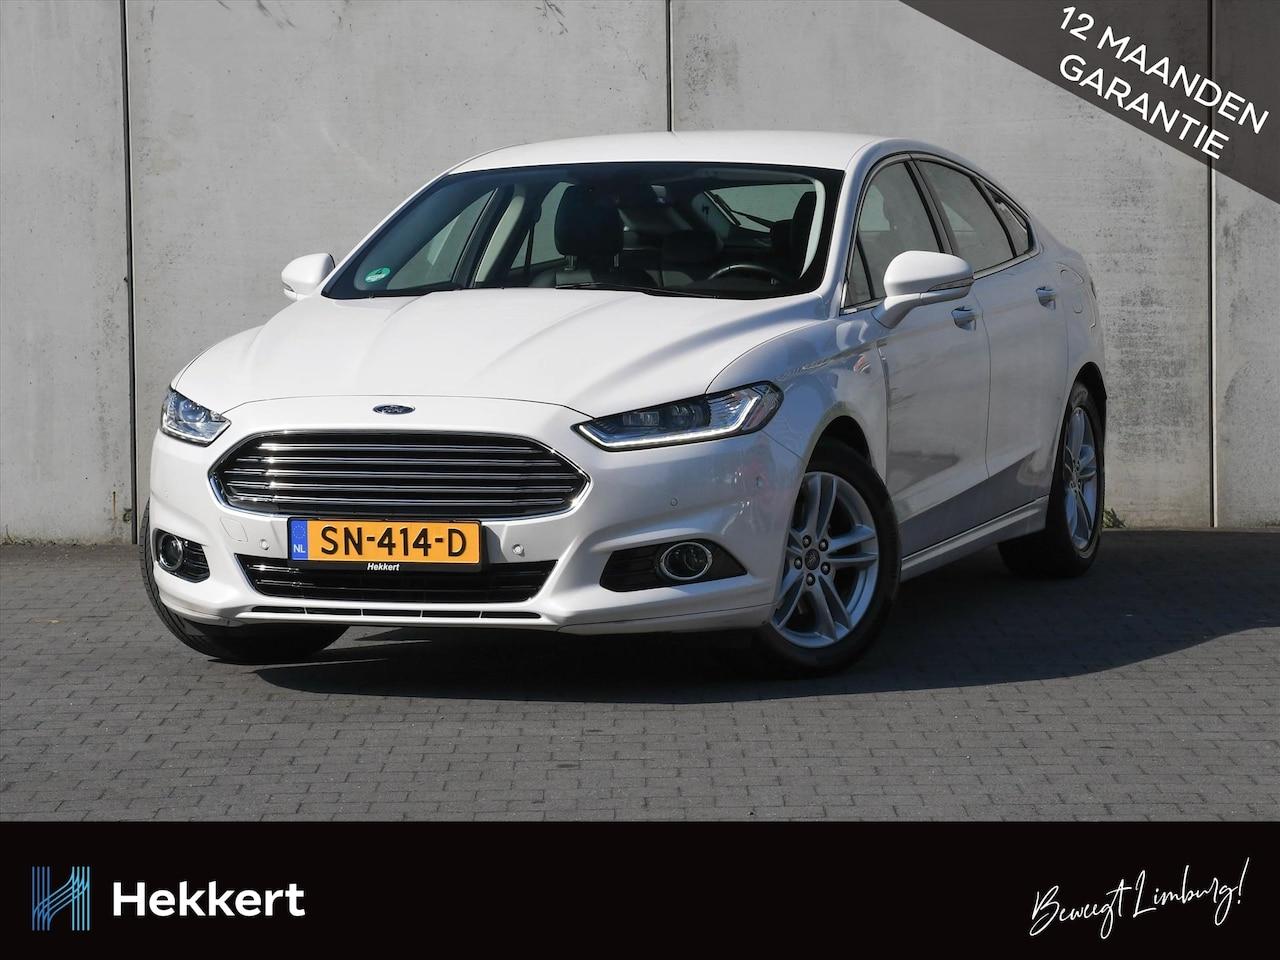 Ford Mondeo - Titanium 1.5 EcoBoost 160pk NAVI   WINTER PACK   CRUISE   LANE KEEPING AID   LEER   AUT. I - AutoWereld.nl